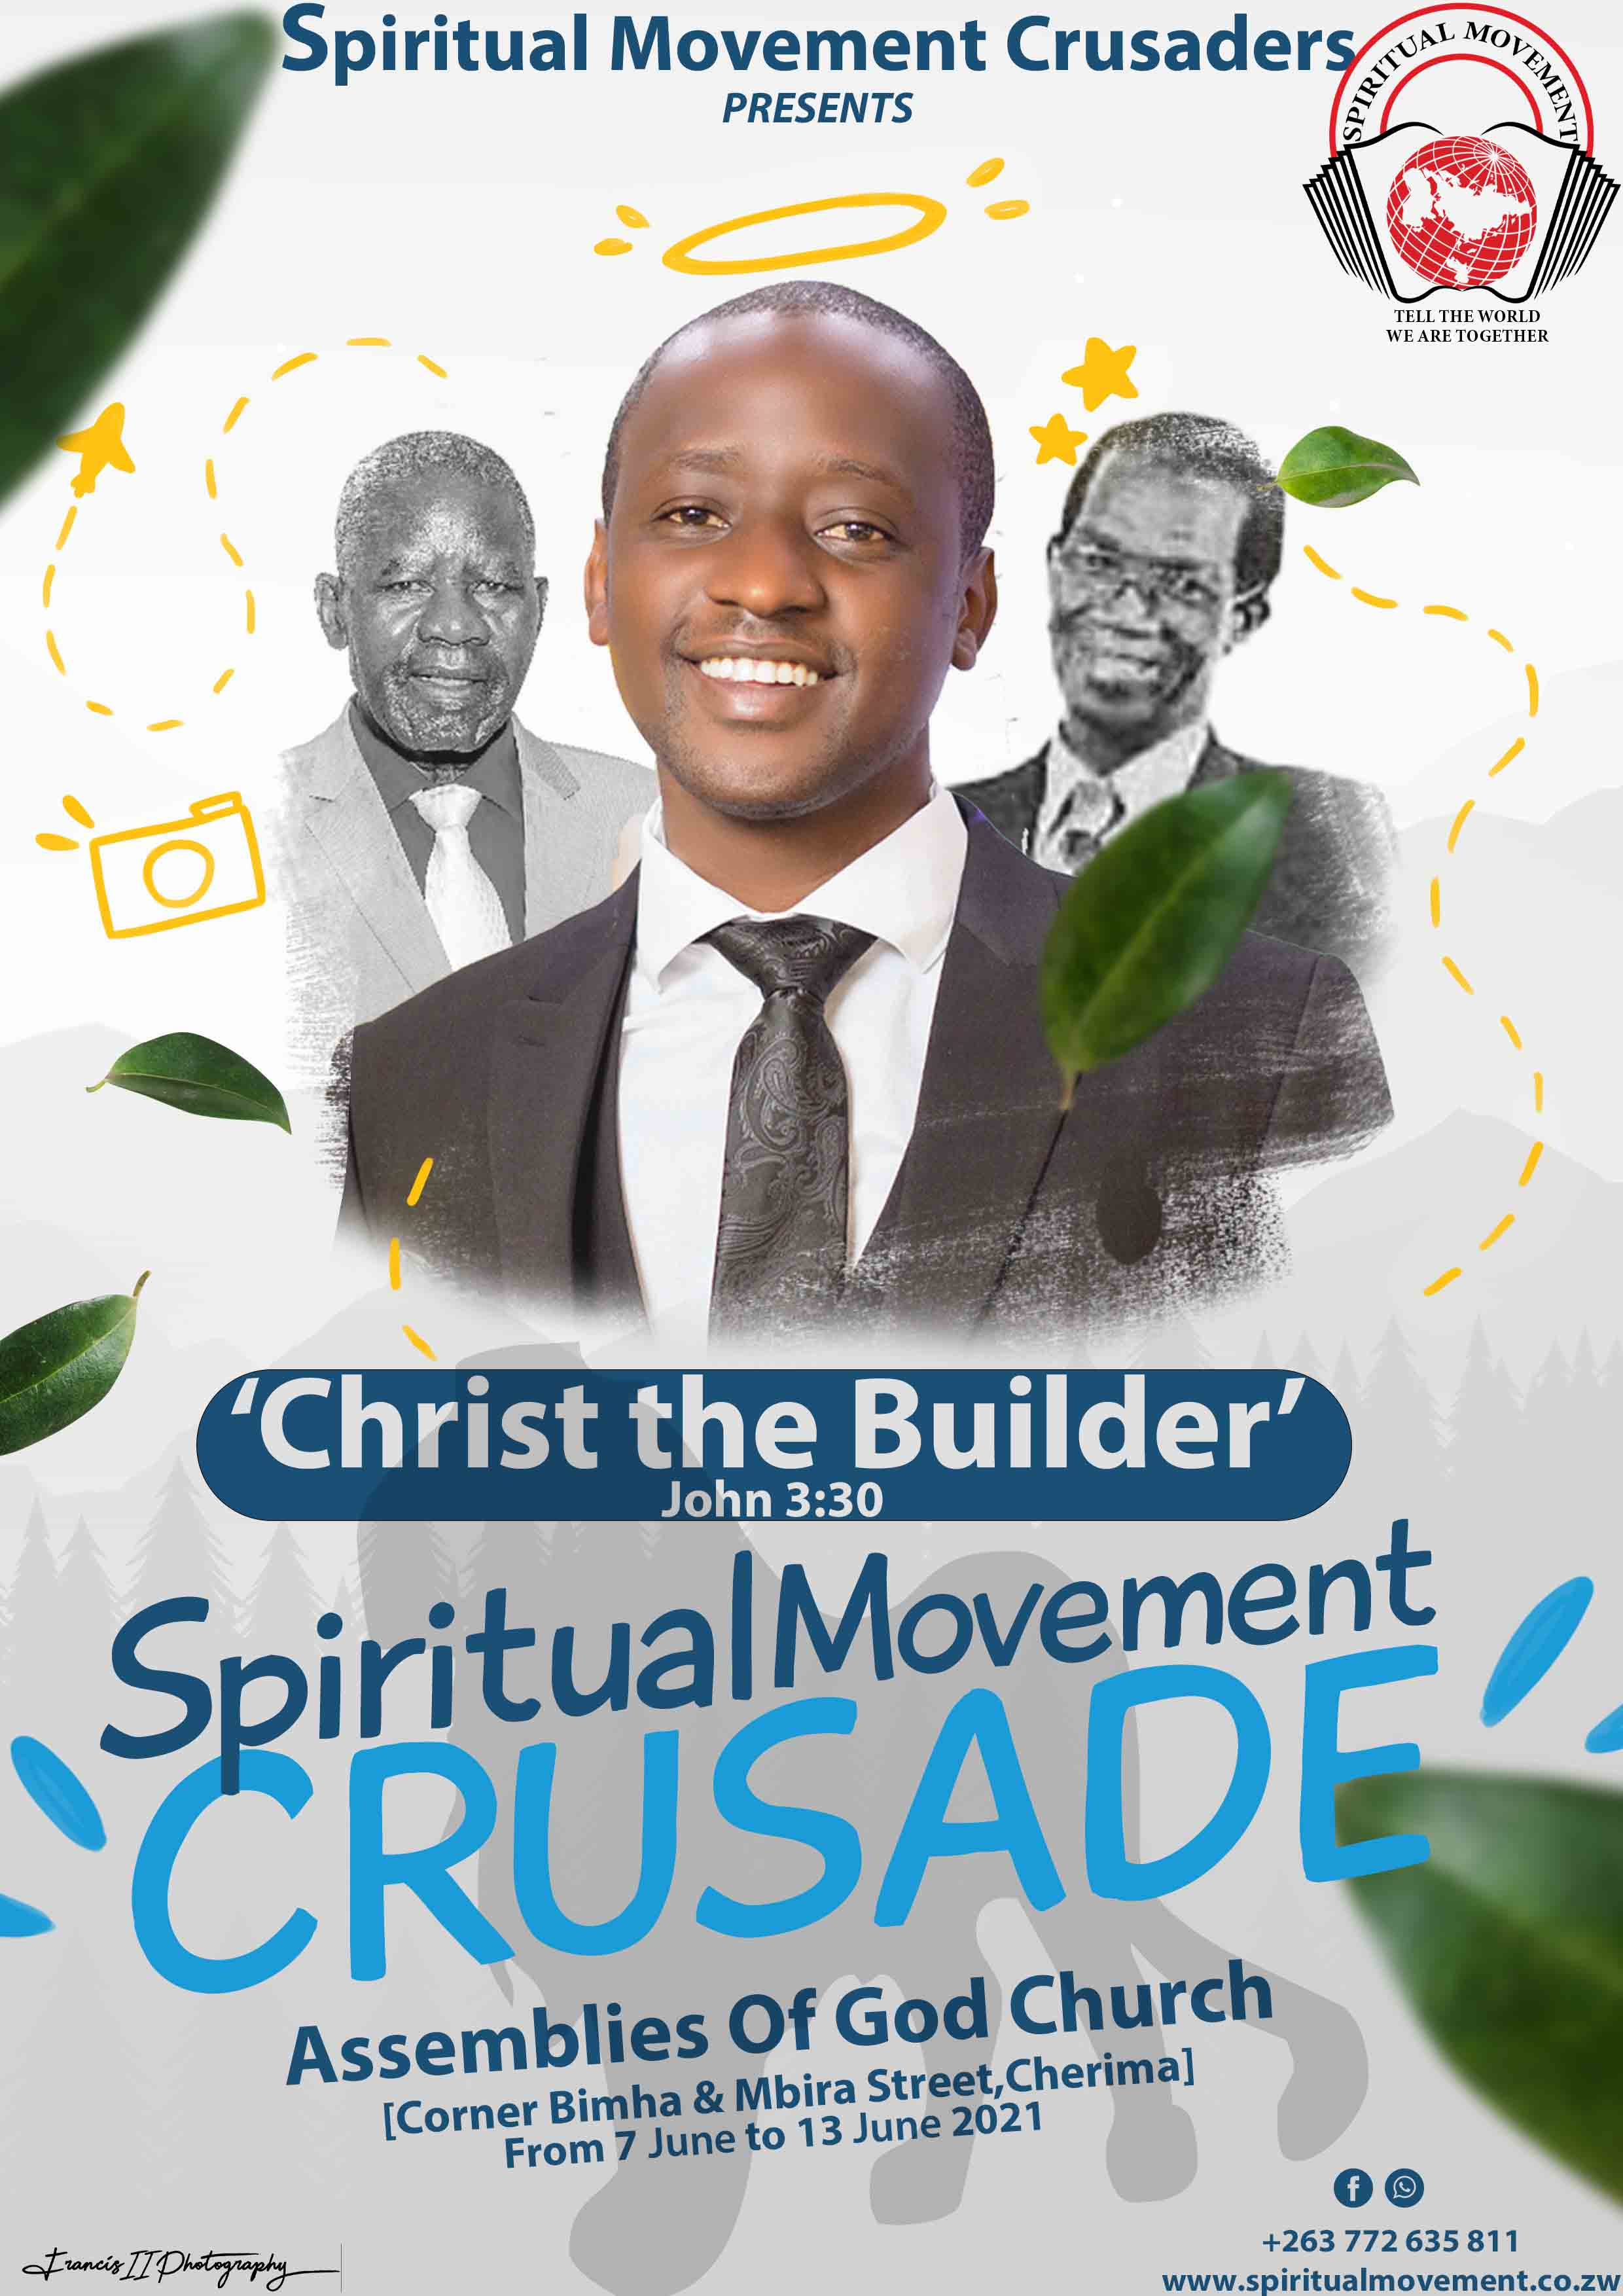 SPIRITUAL MOVEMENT CRUSADE